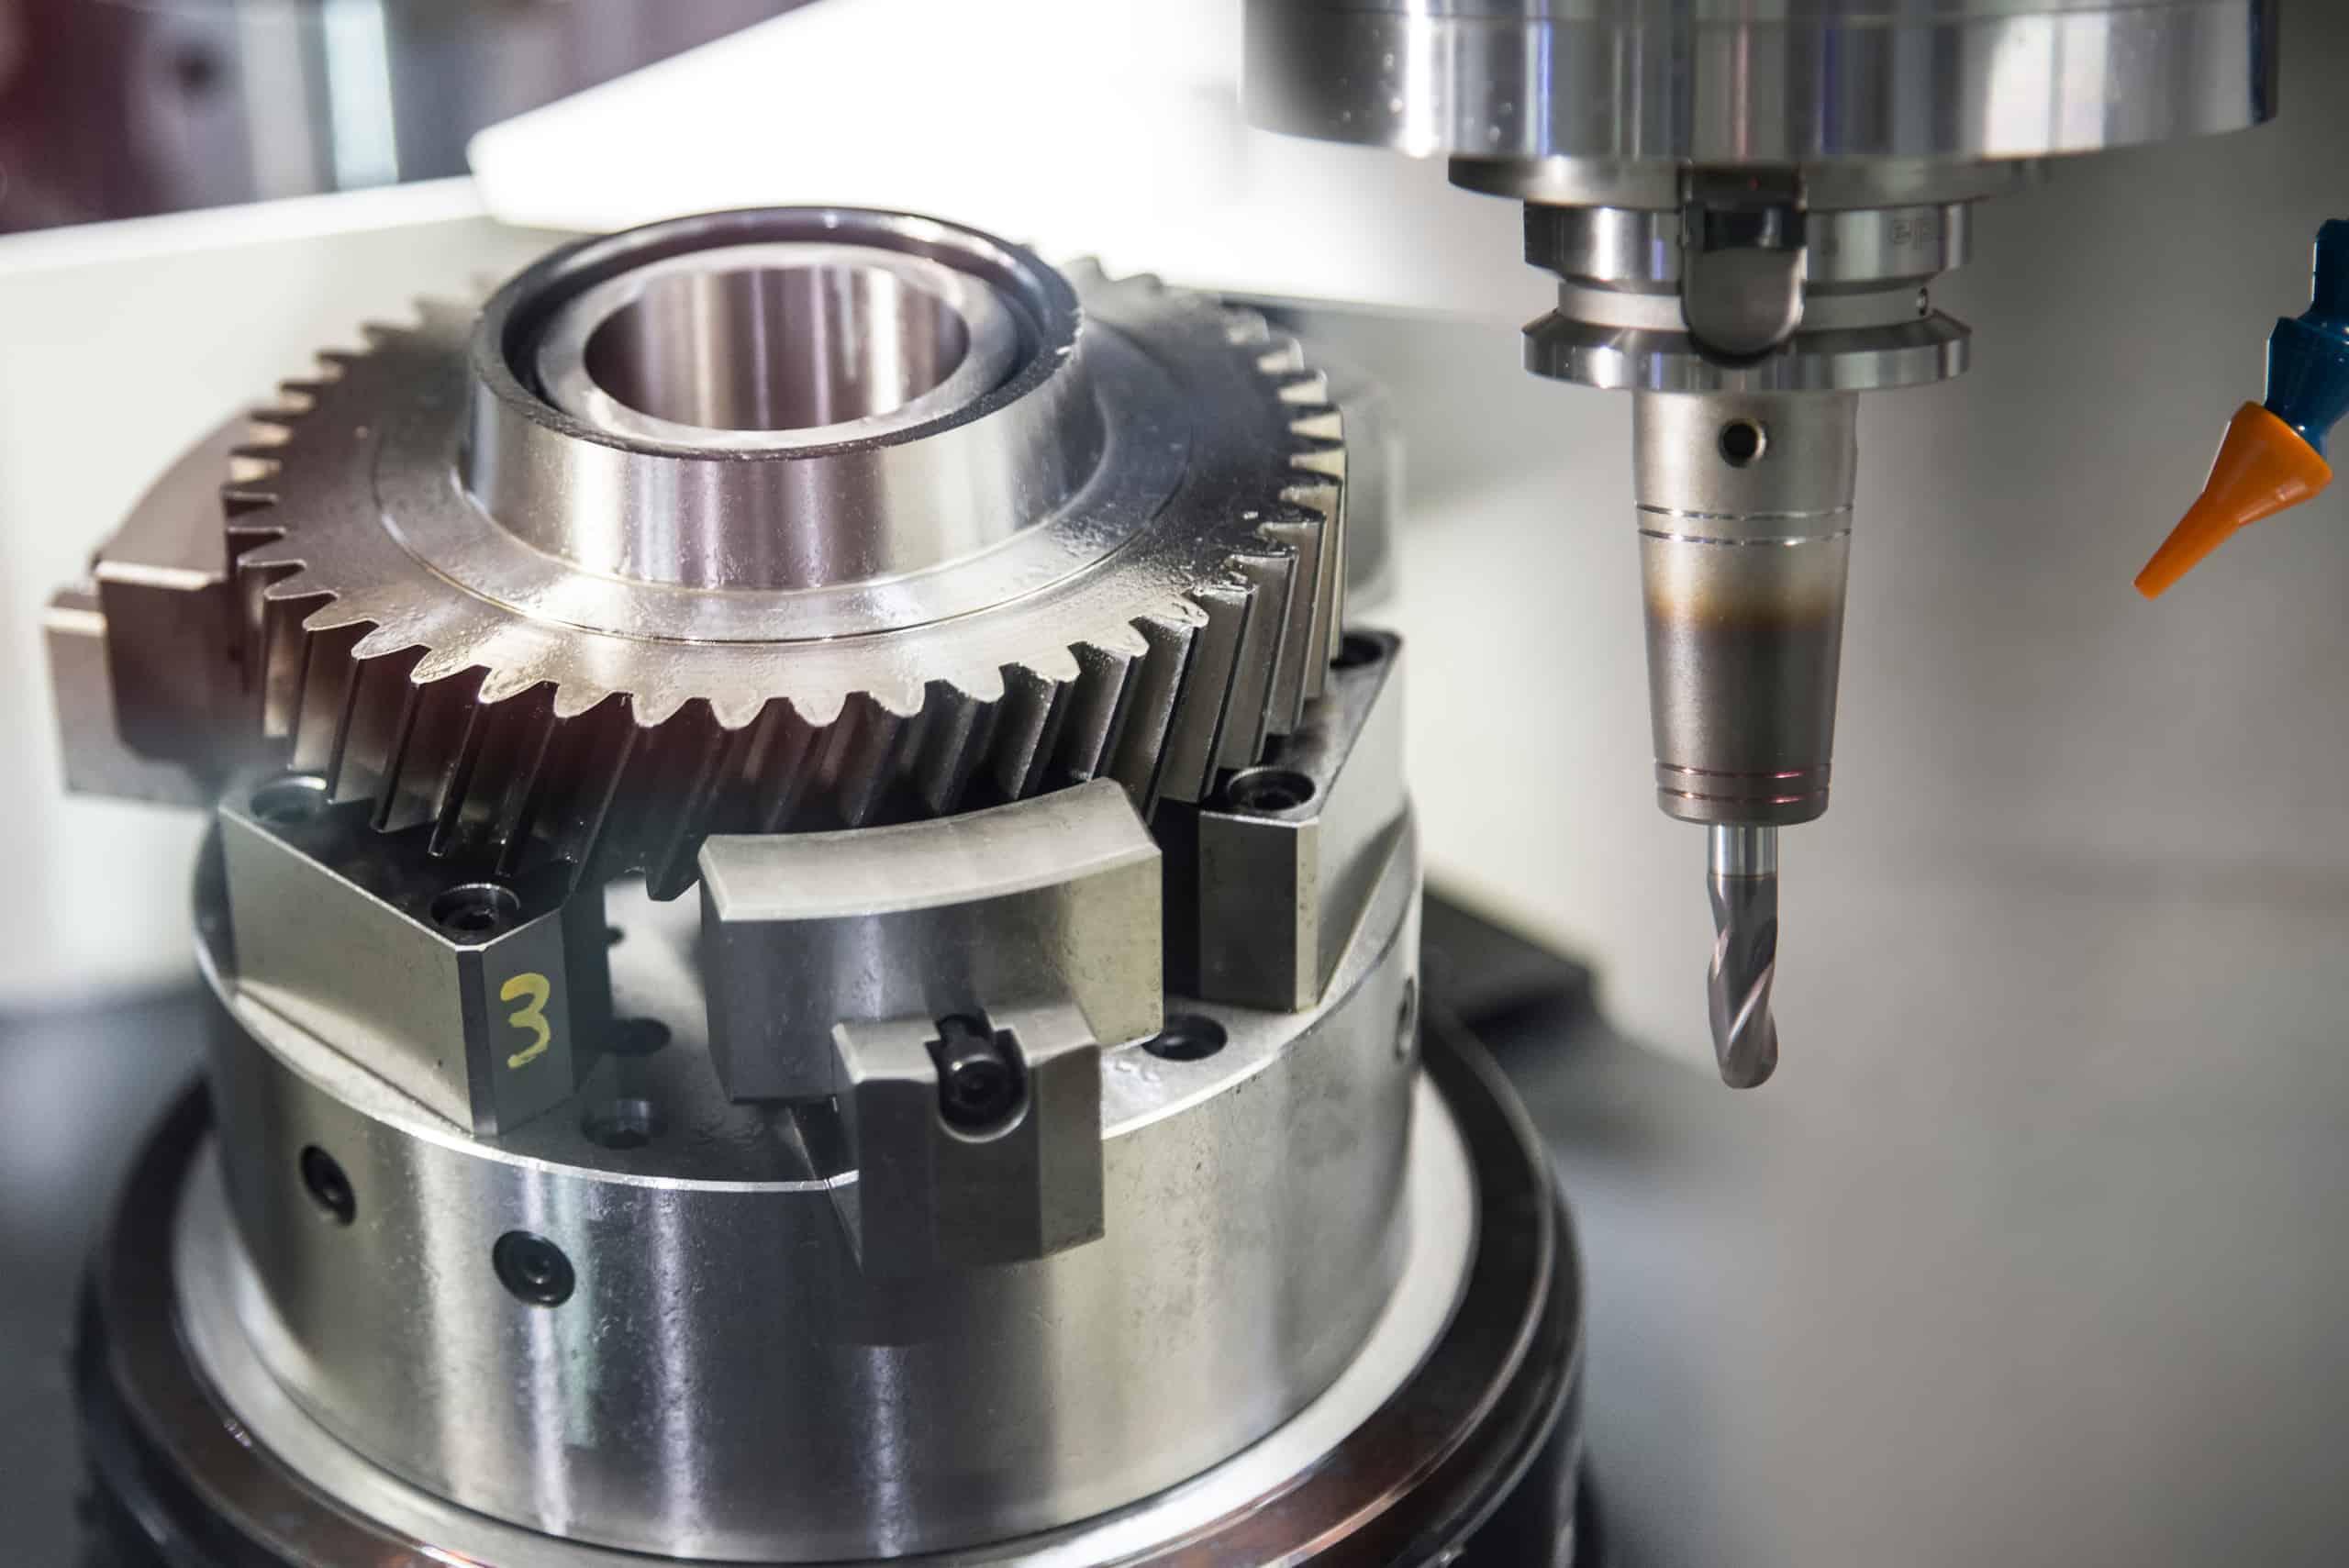 The Cnc Milling Machine Cutting